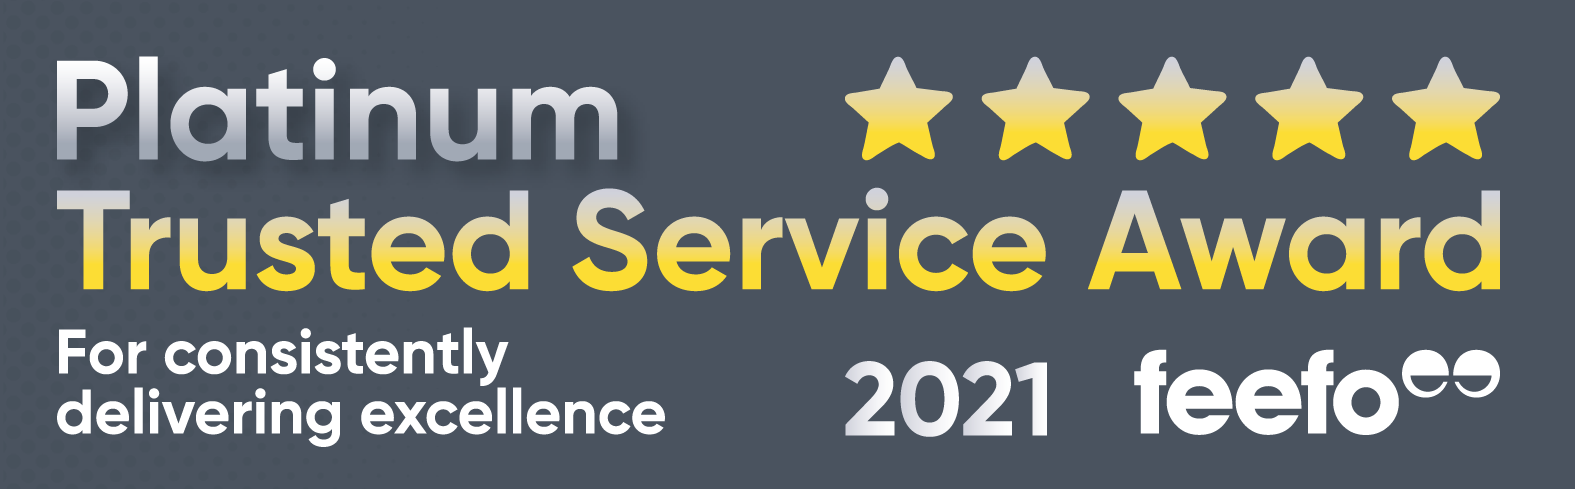 Feefo Platinum Trusted Service Award 2020